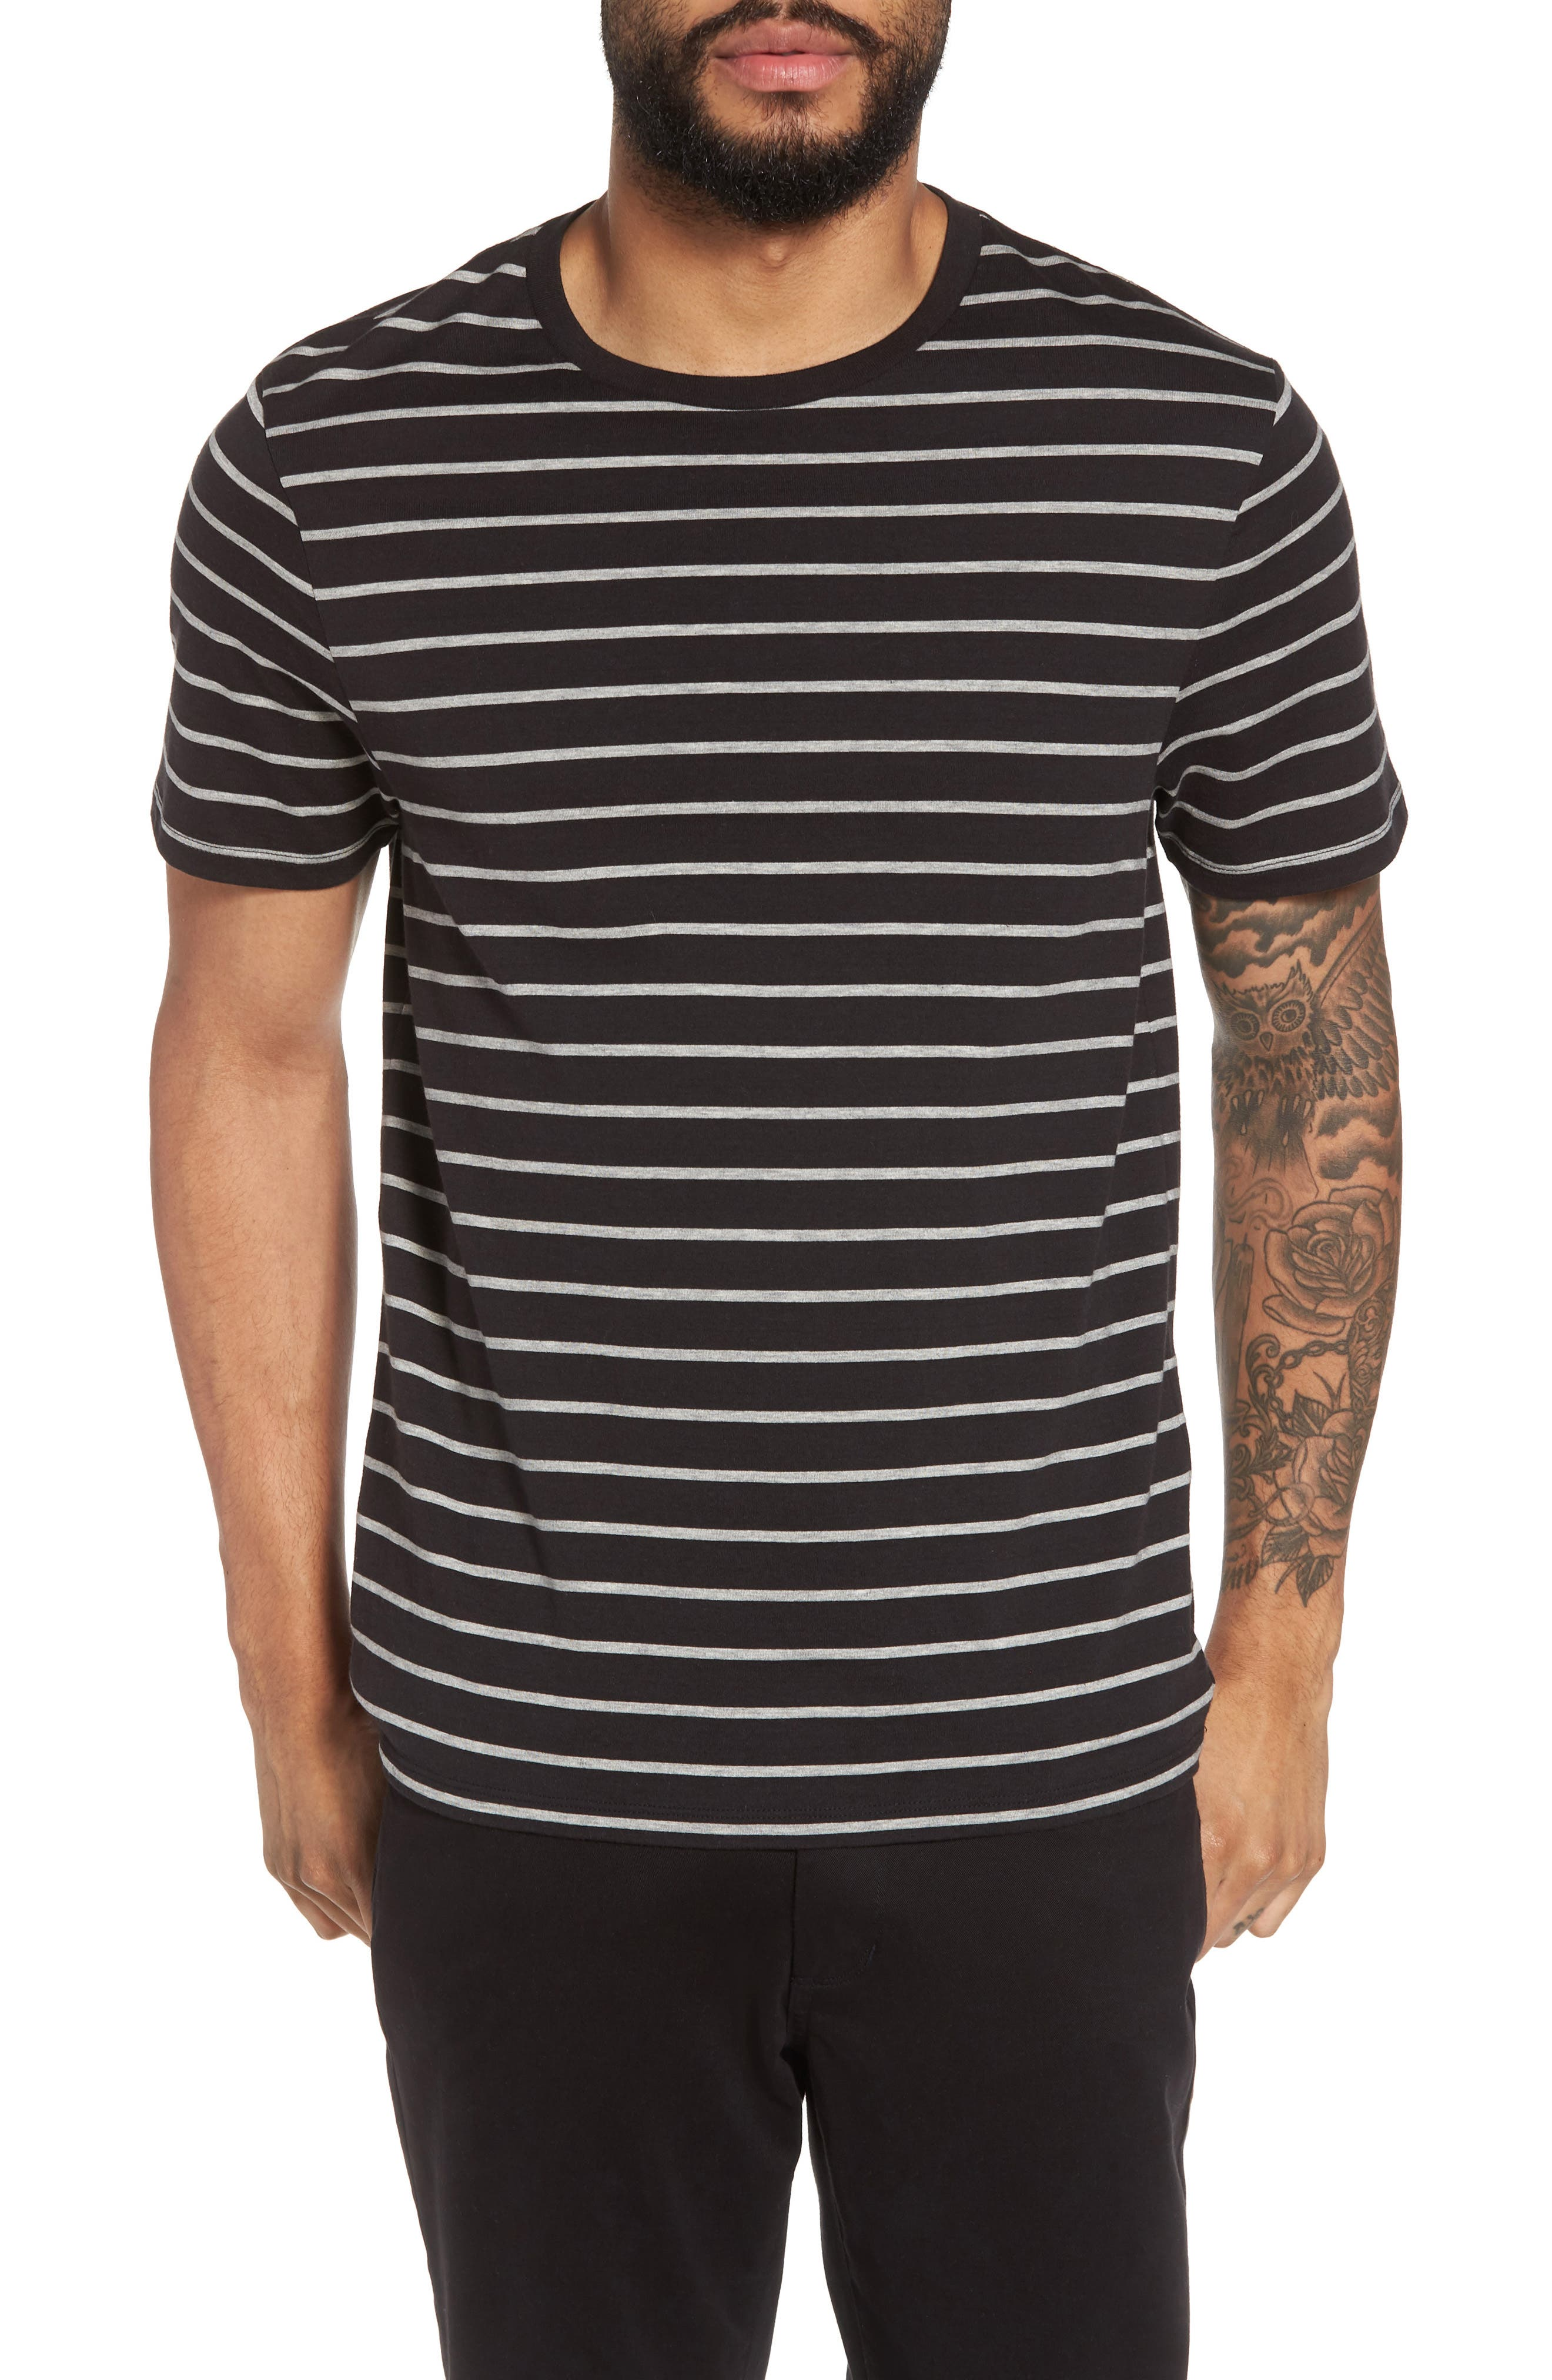 Slim Fit Heathered Stripe T-Shirt,                             Main thumbnail 1, color,                             Black/ Heather Steel